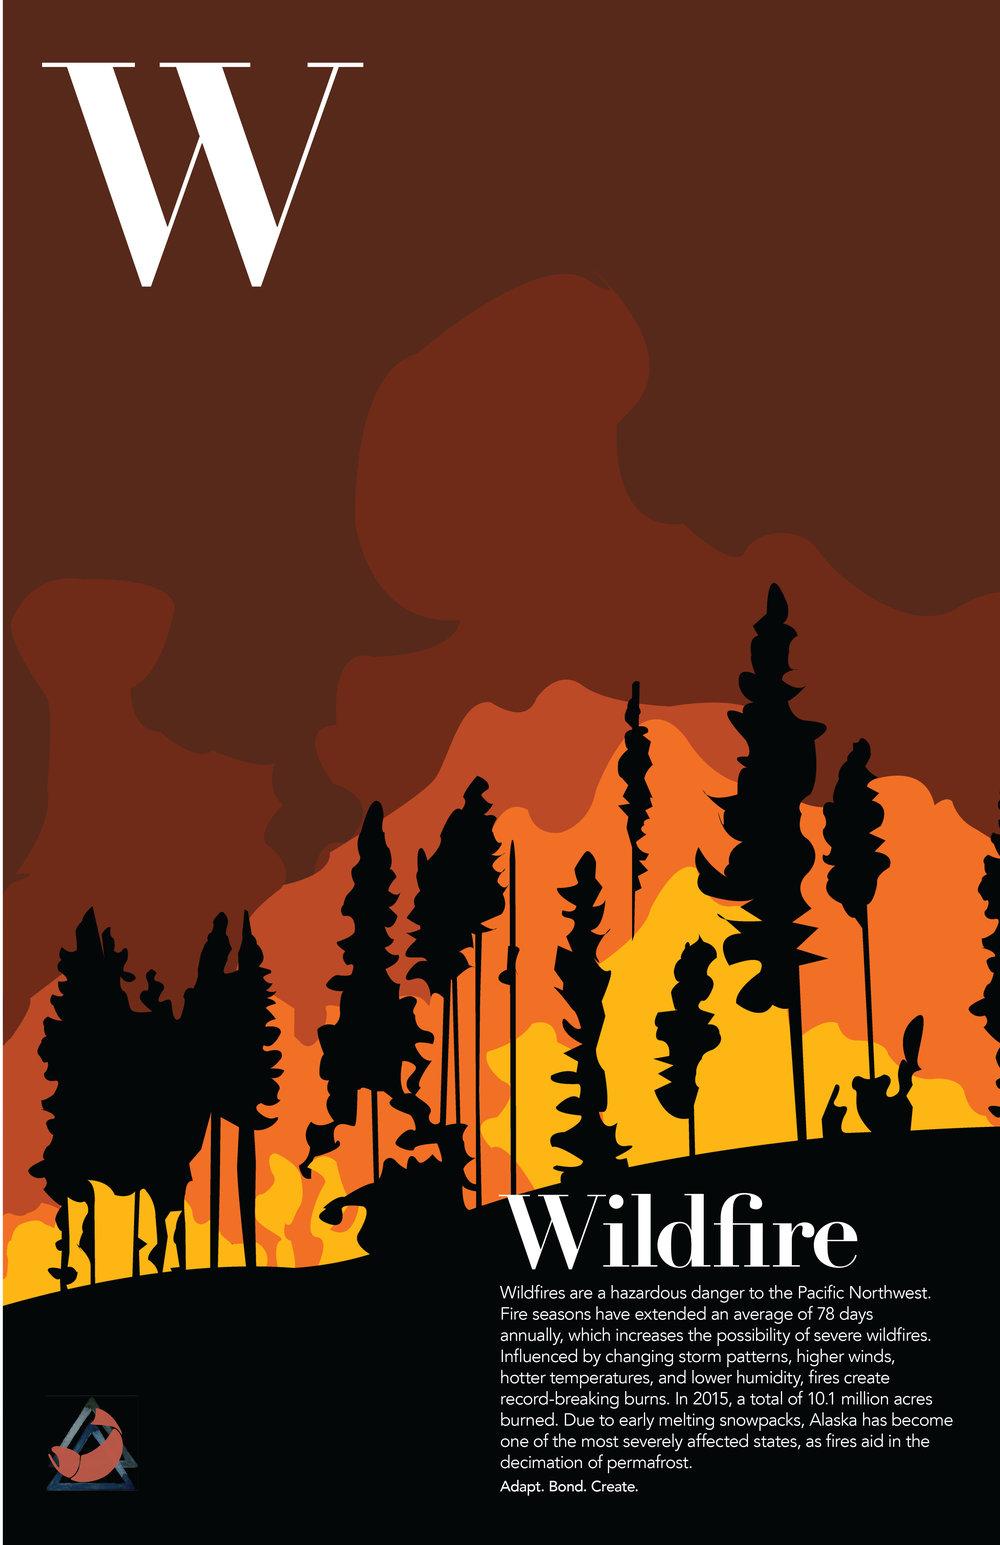 wildfire_final copy.jpg